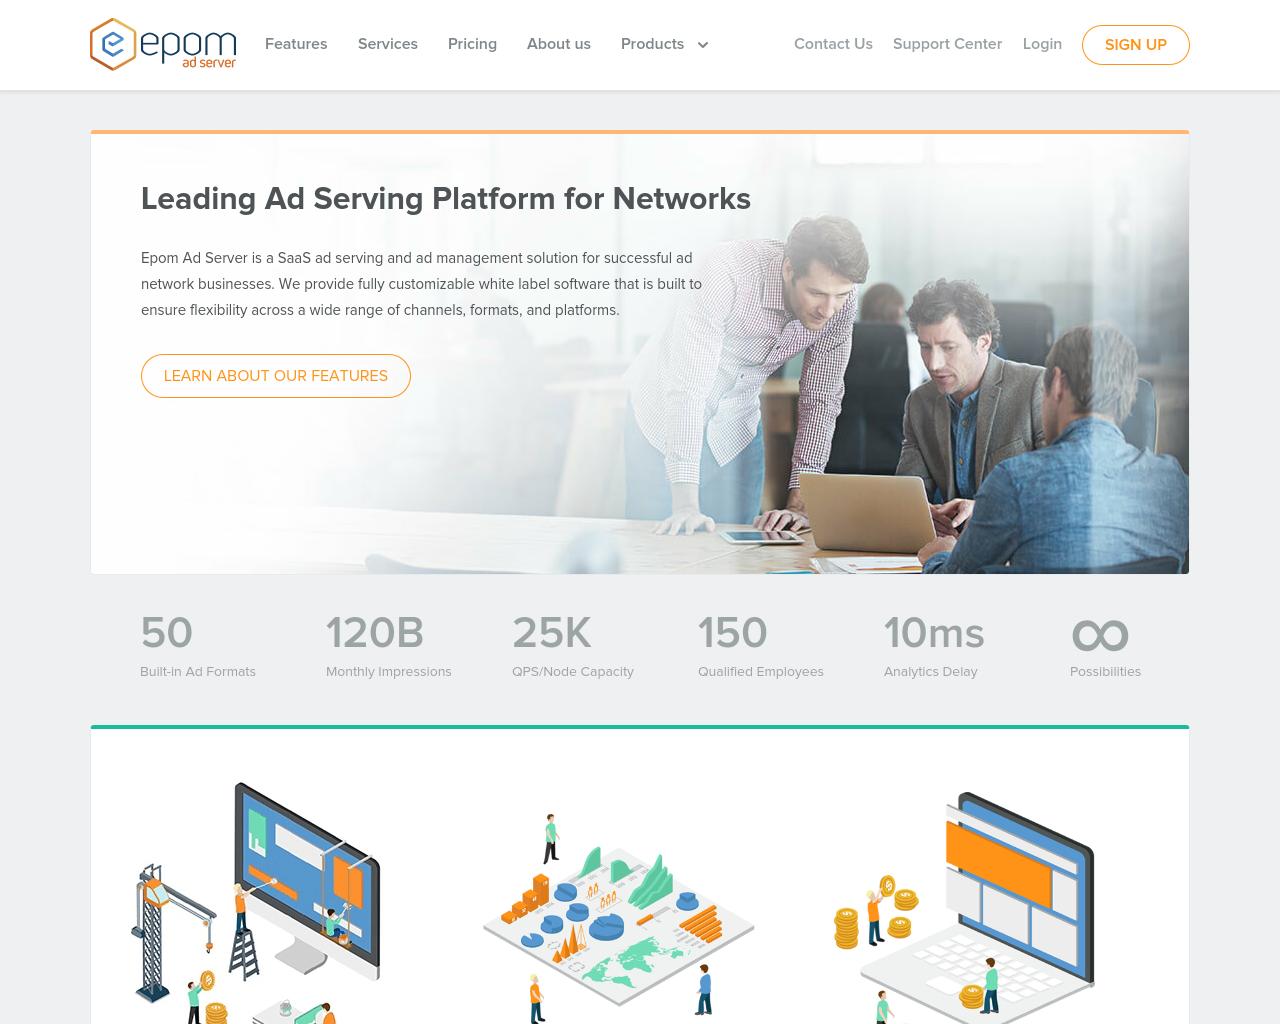 Epom-Ad-Server-|-Epom-Market-Advertising-Reviews-Pricing